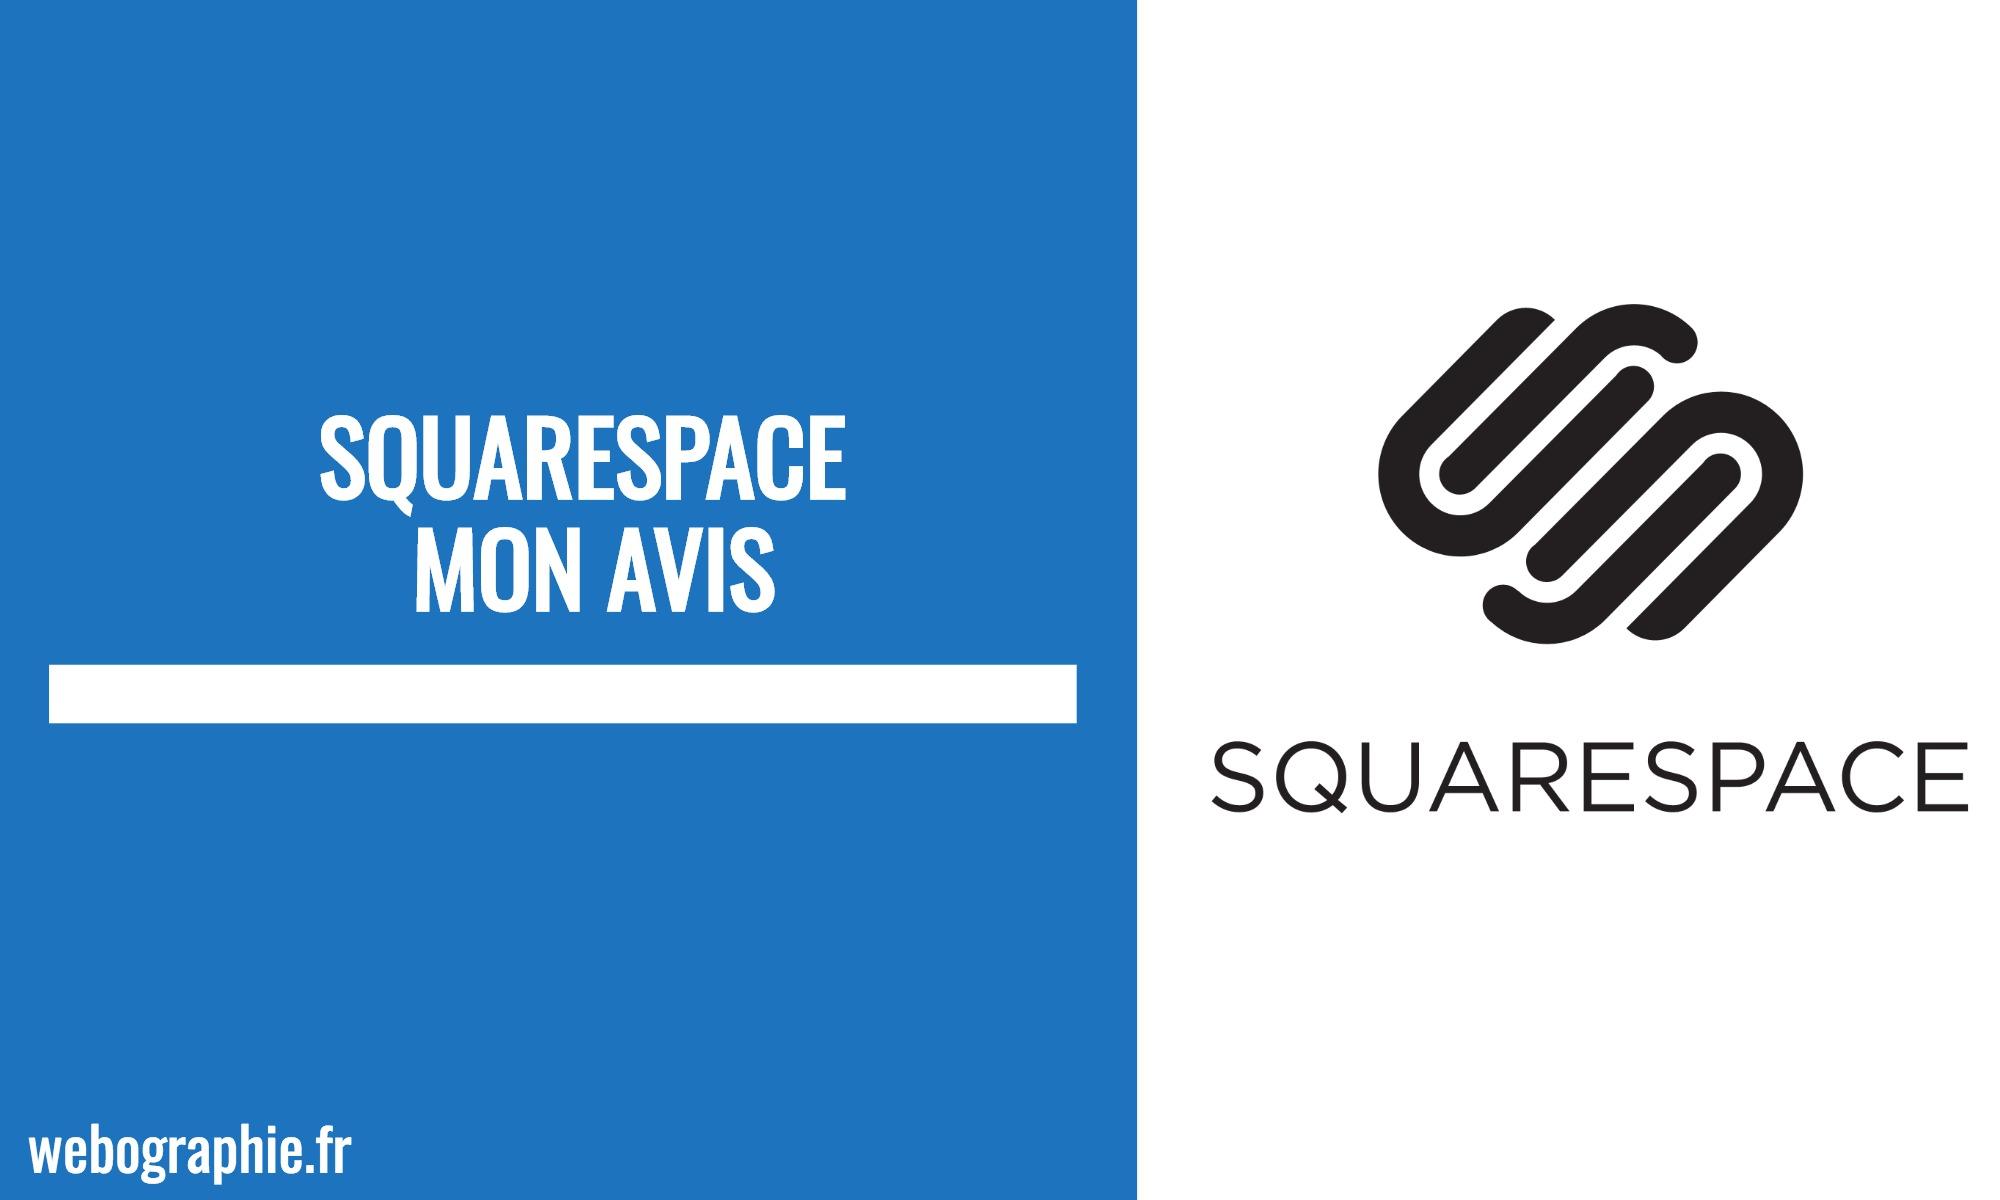 squarespace mon avis